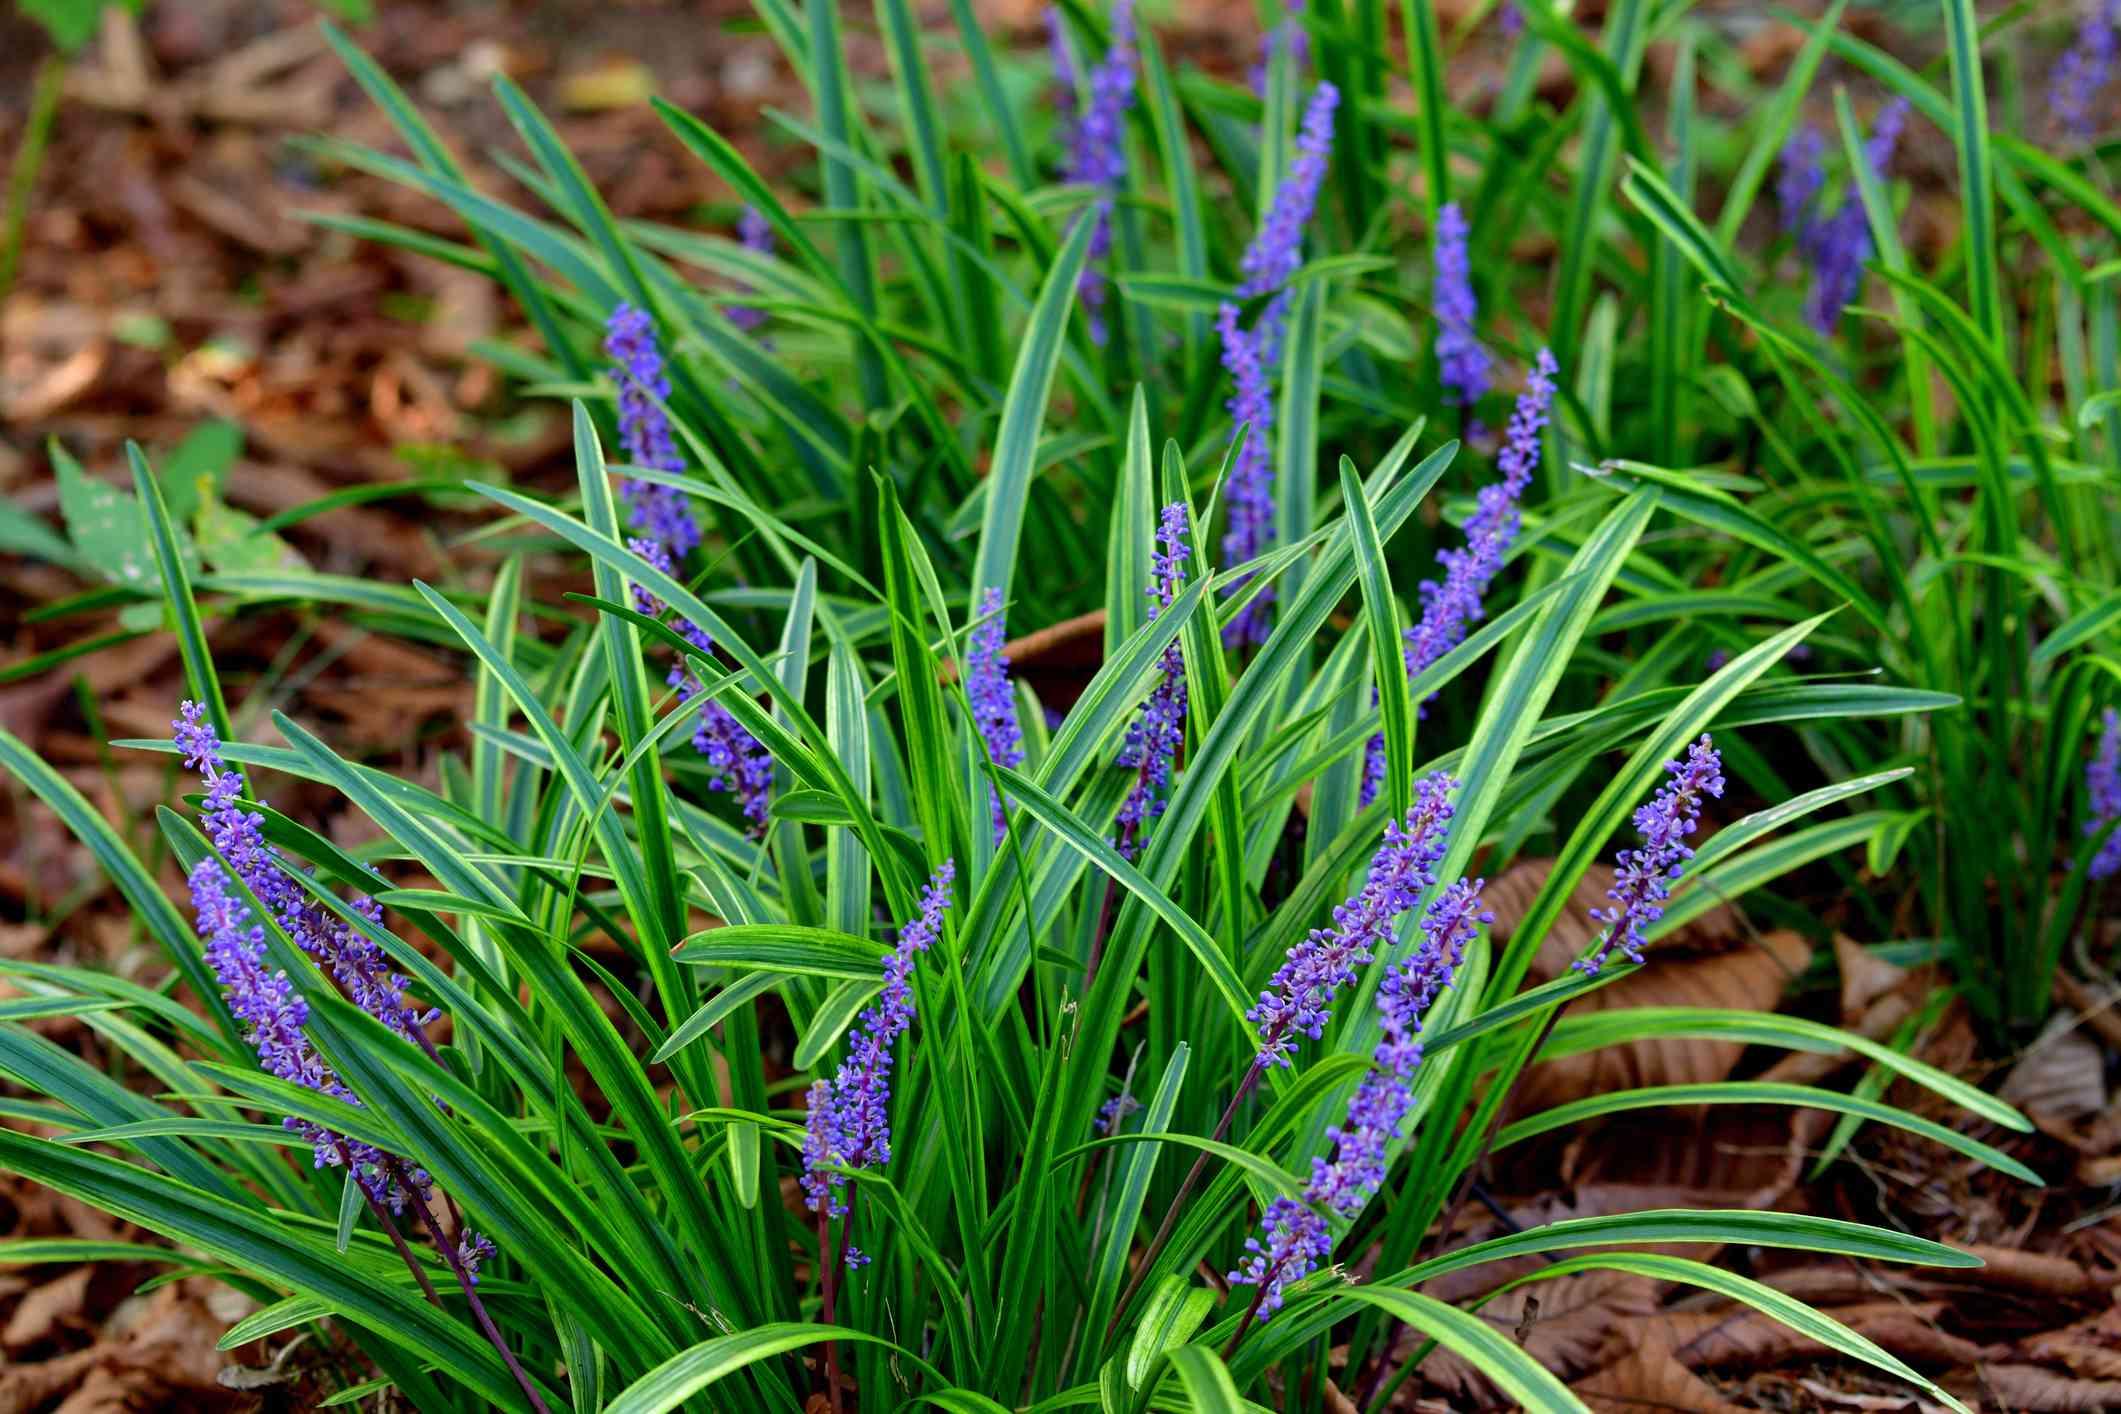 Liriope muscari / Lilyturf / Monkey grass Flower